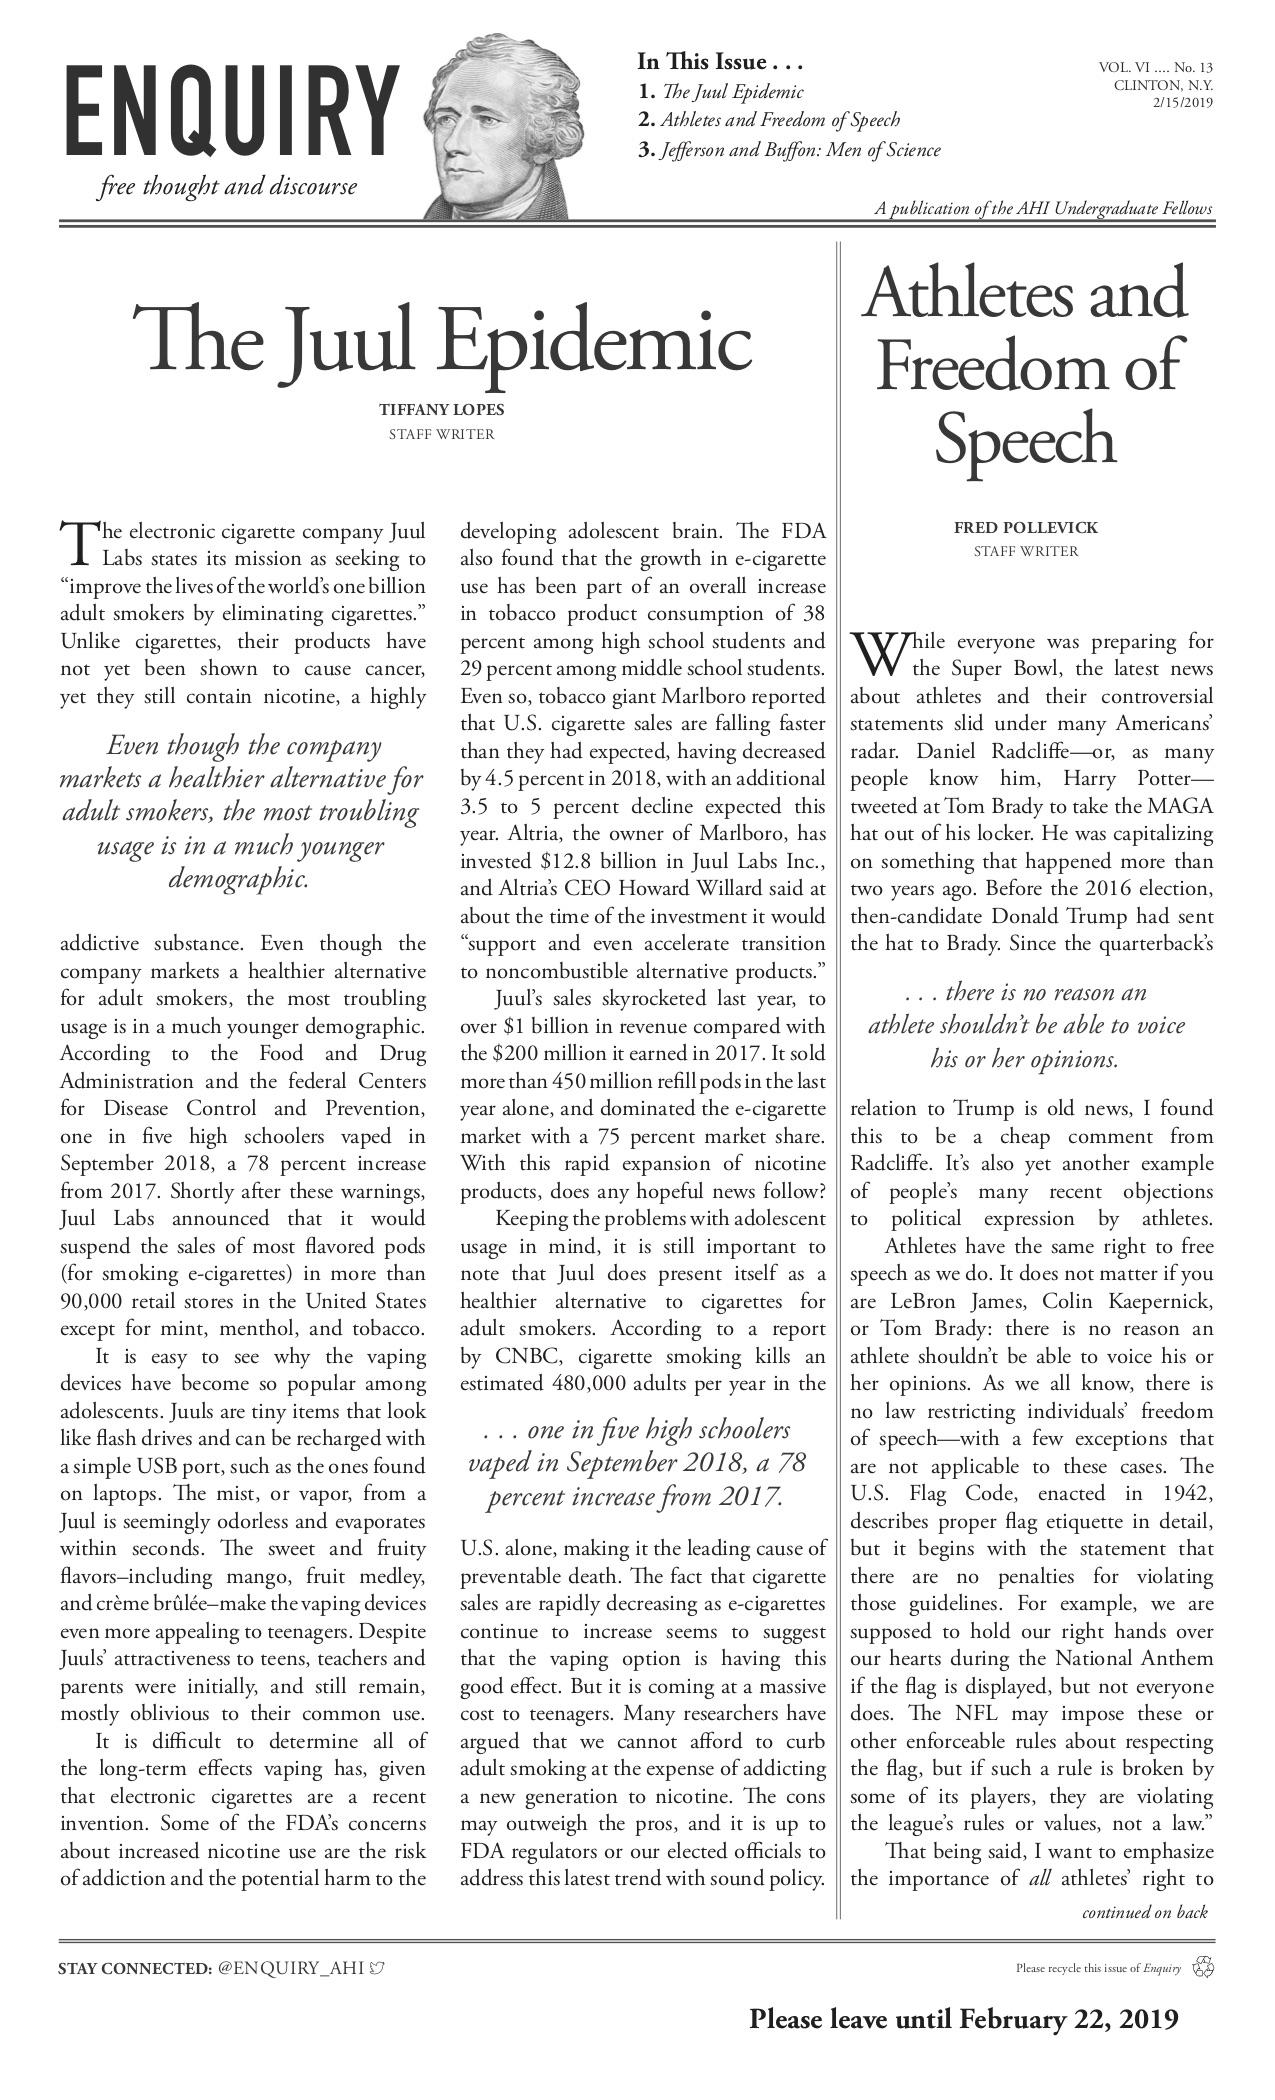 Enquiry Vol 6 No 13 p1.jpg